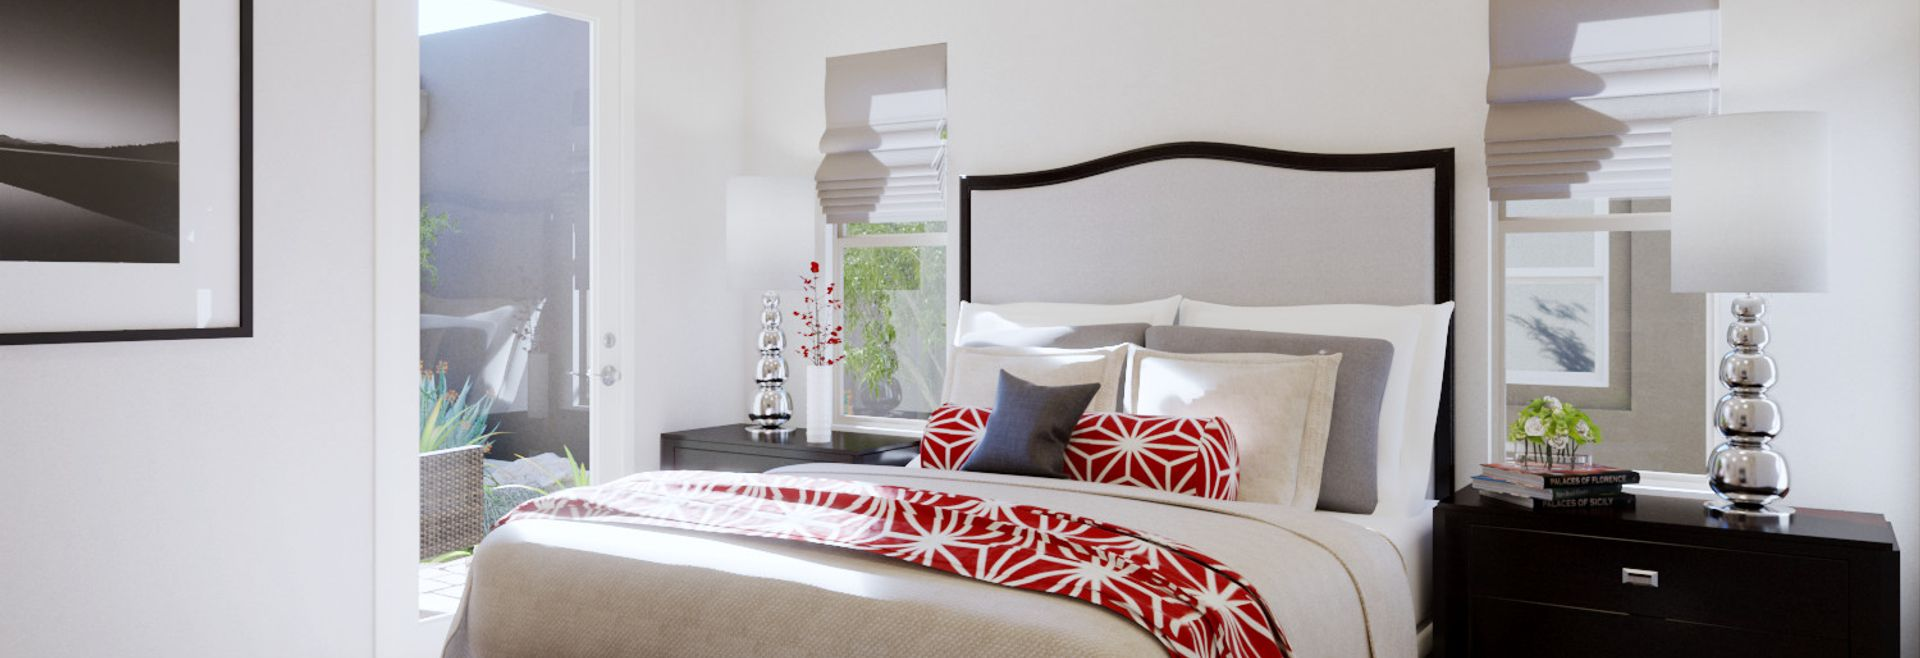 Trilogy Summerlin Radiant Virtually Staged Master Bedroom